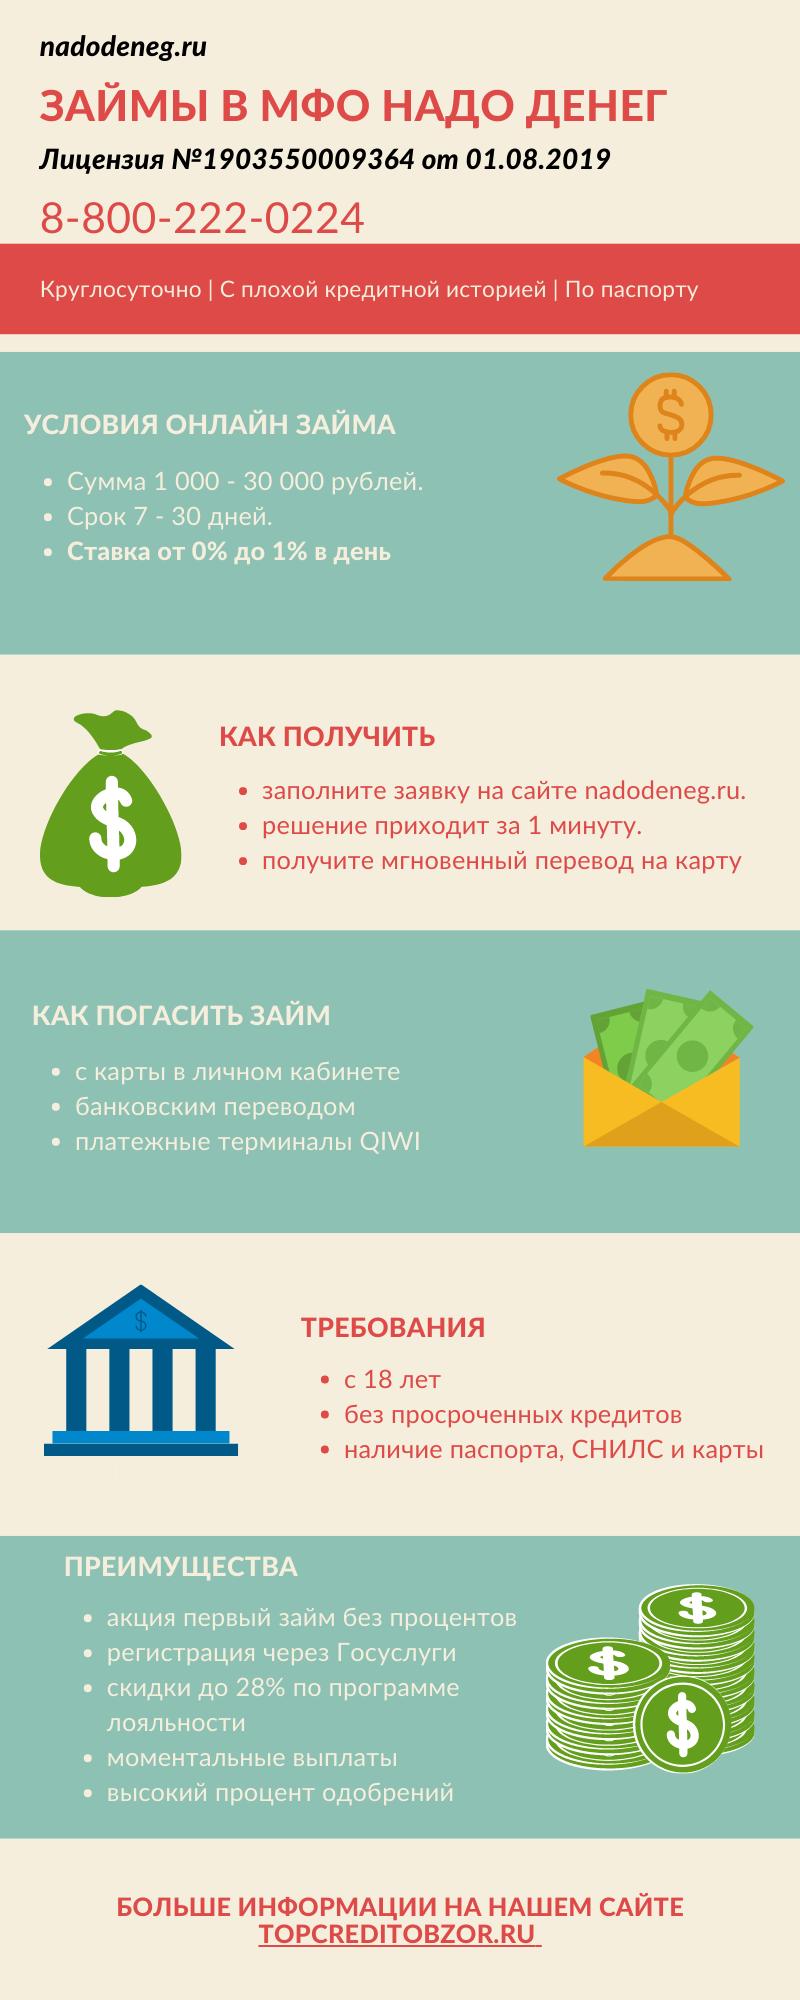 Инфографика МФО Надо денег